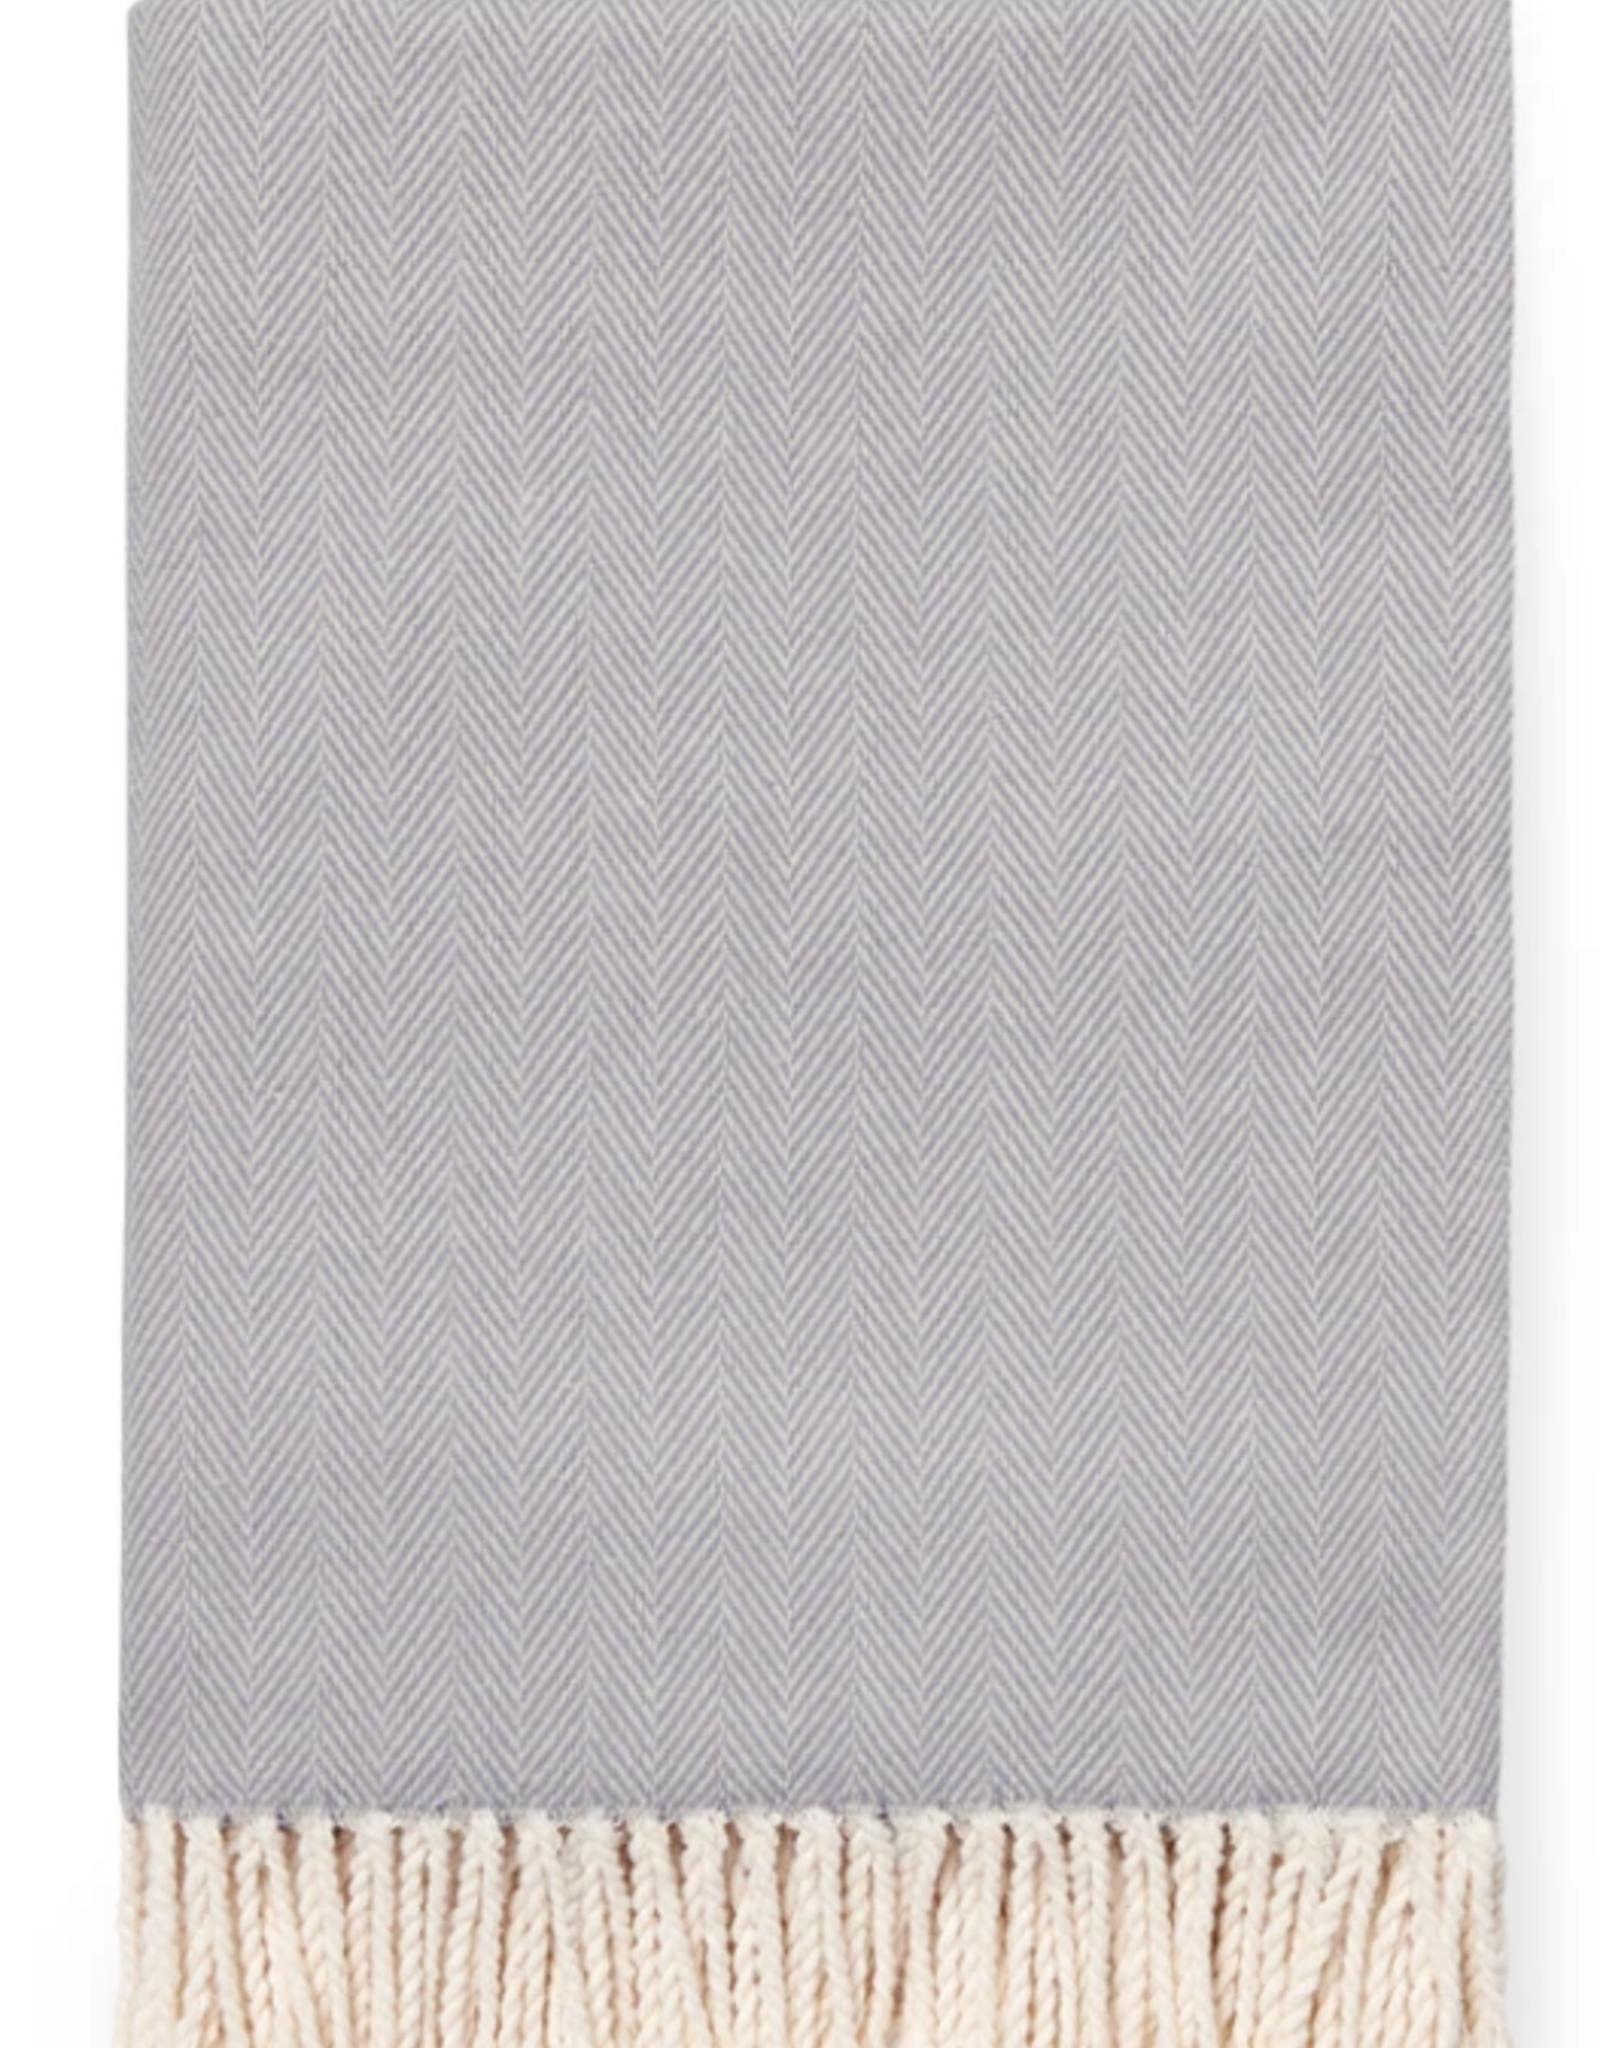 Sferra Celine Throw 100% Cotton 51x70